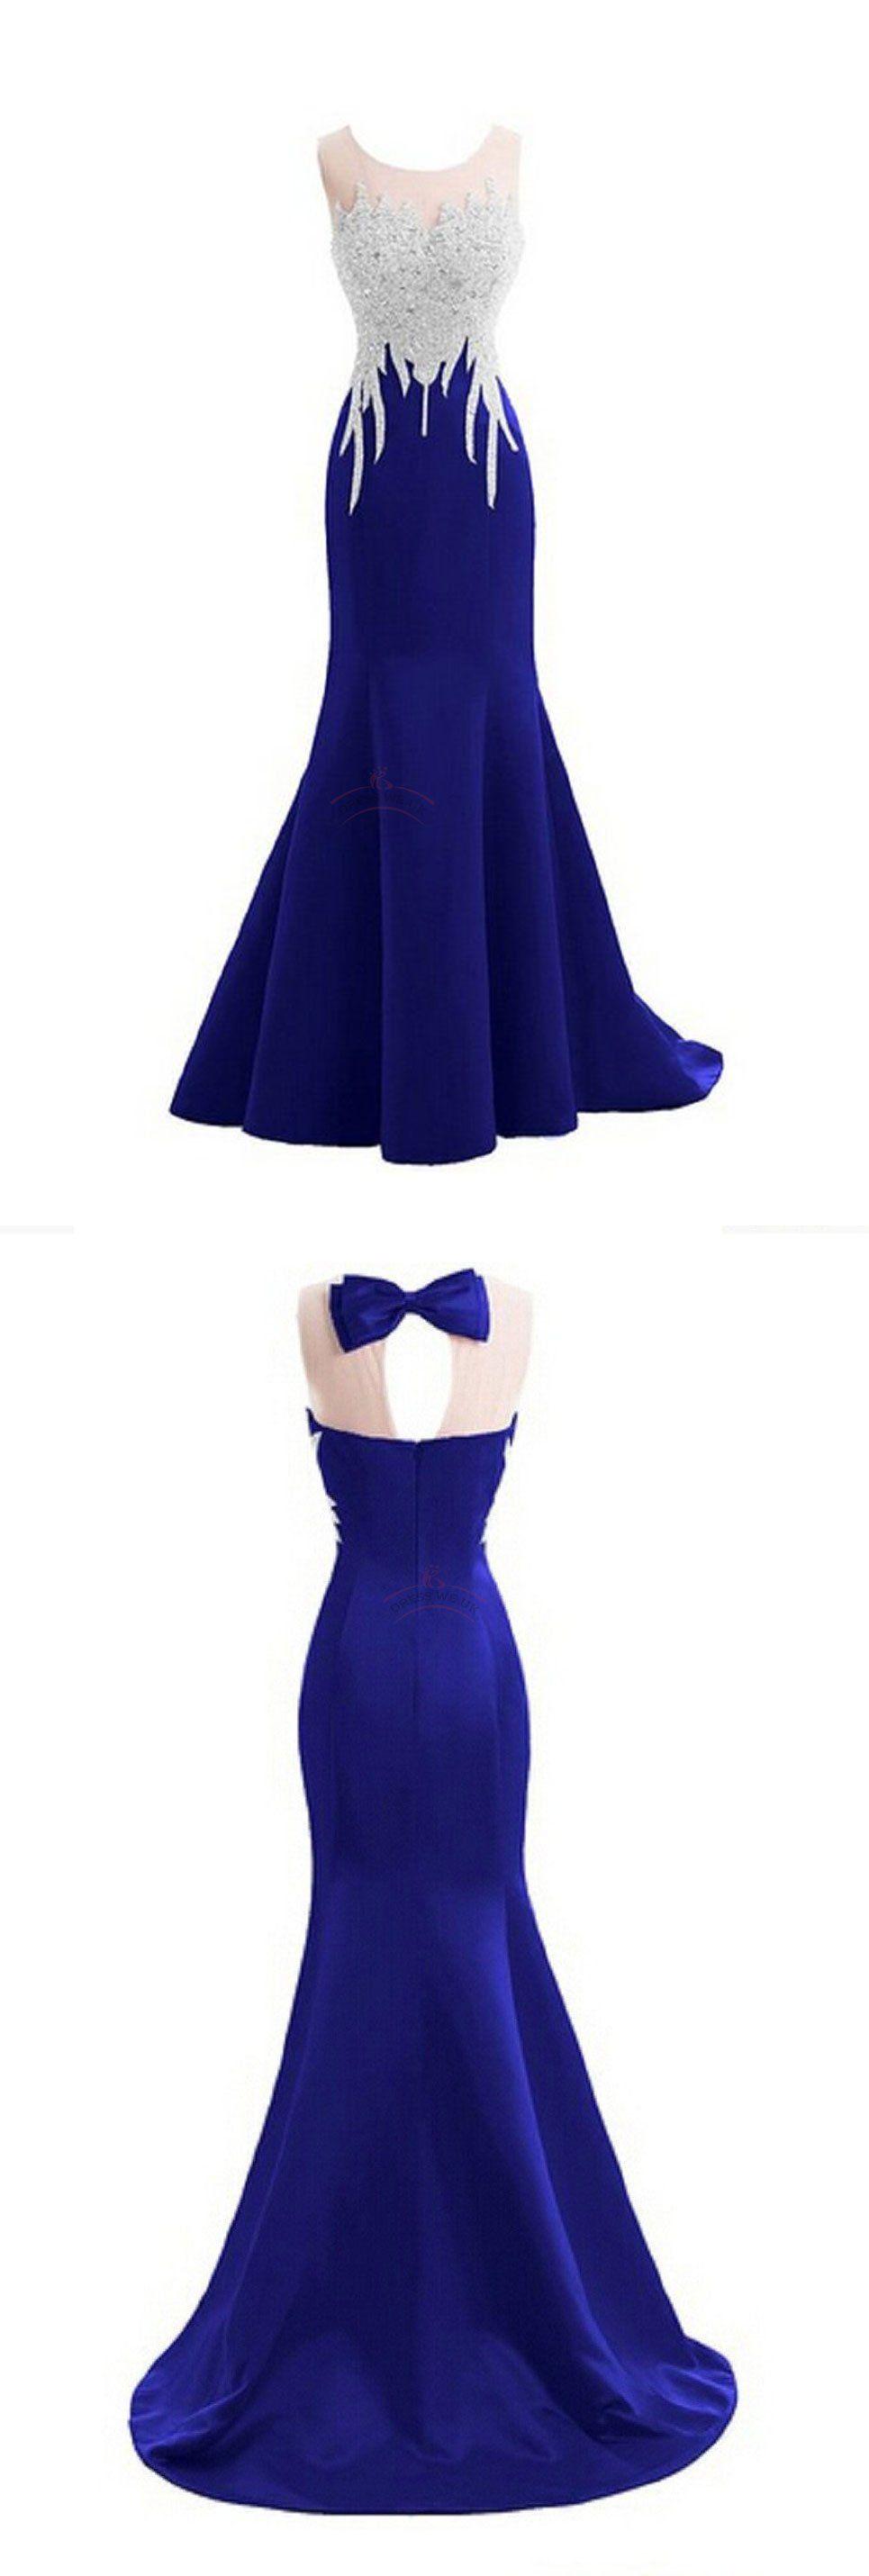 Sexy prom dresses scoop royal blue short train long prom dress